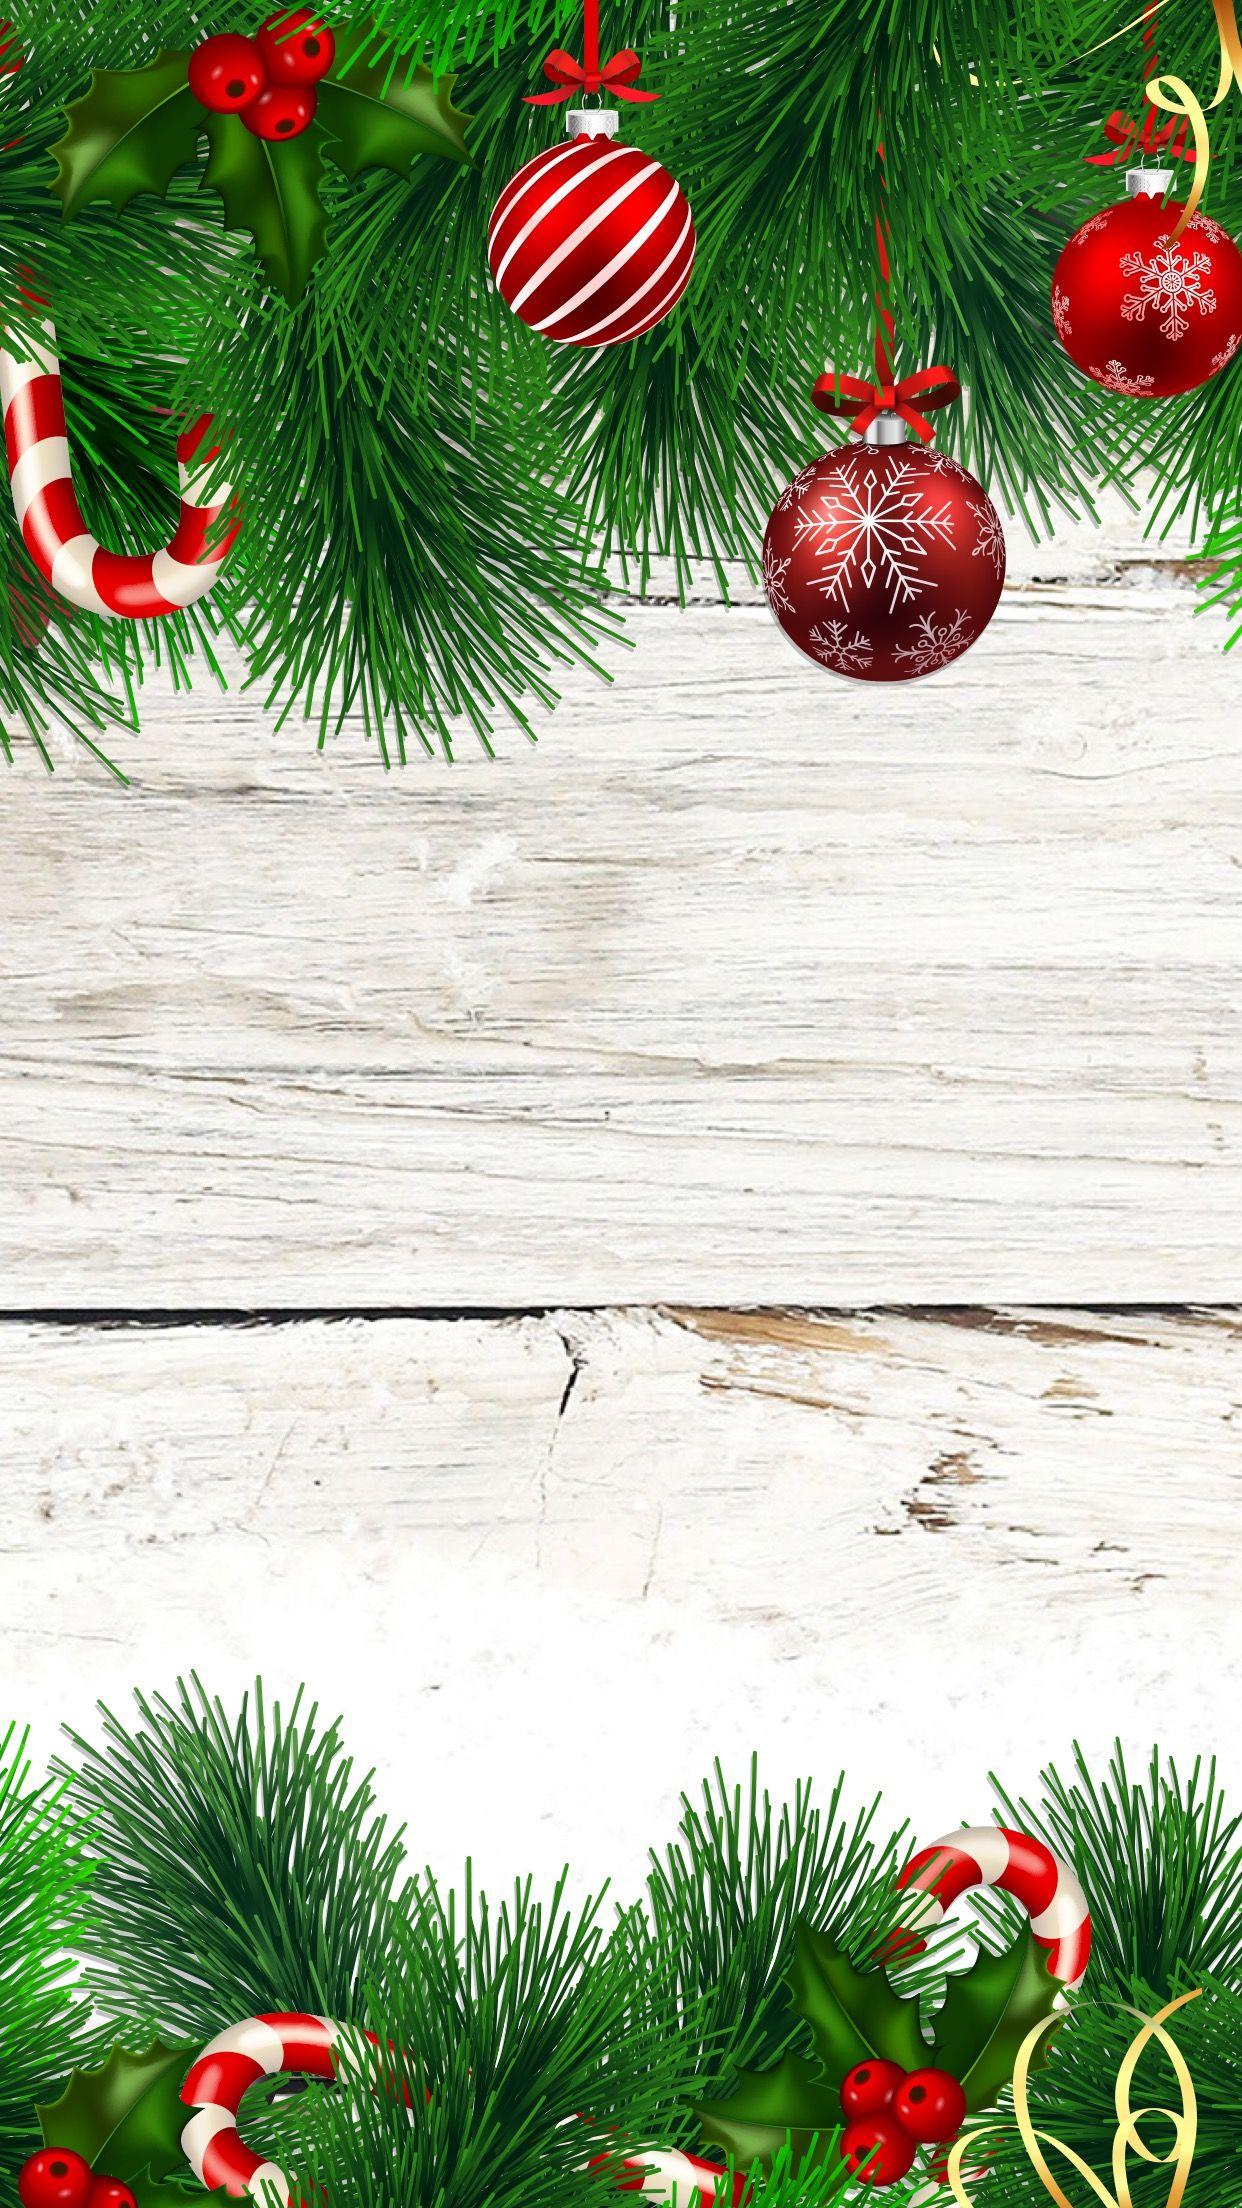 Christmas wallpaper Christmastime is Here! Pinterest